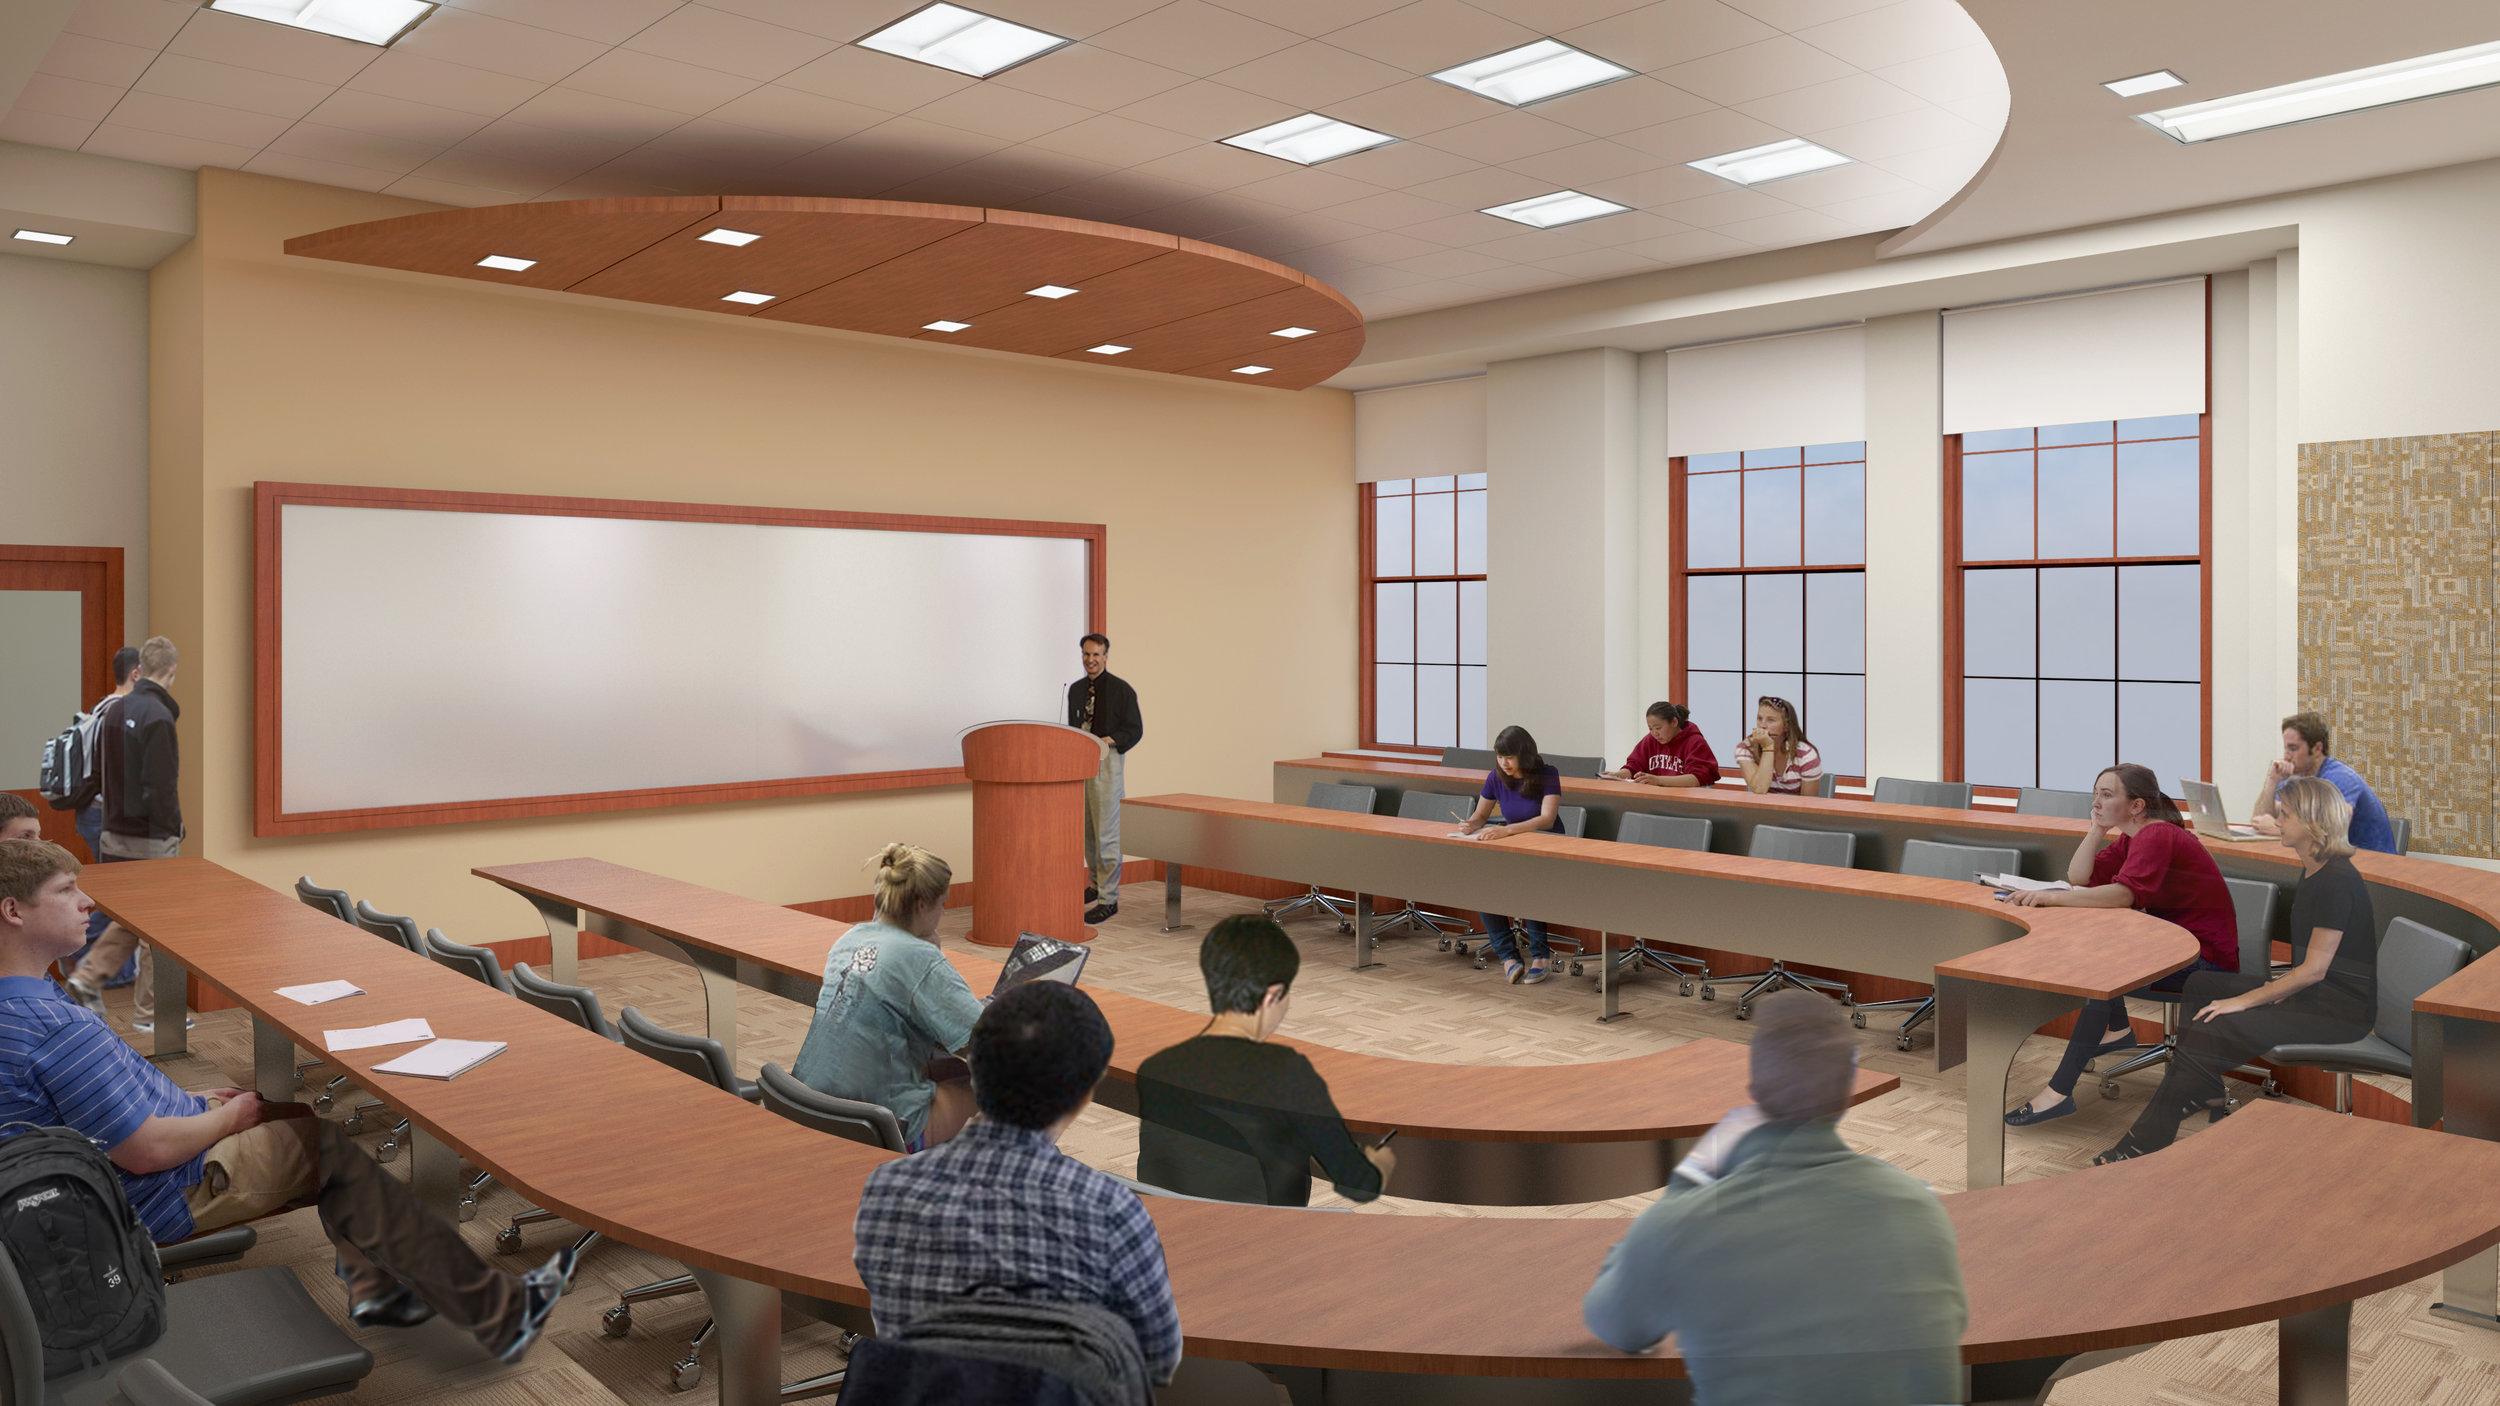 classroom006.jpg